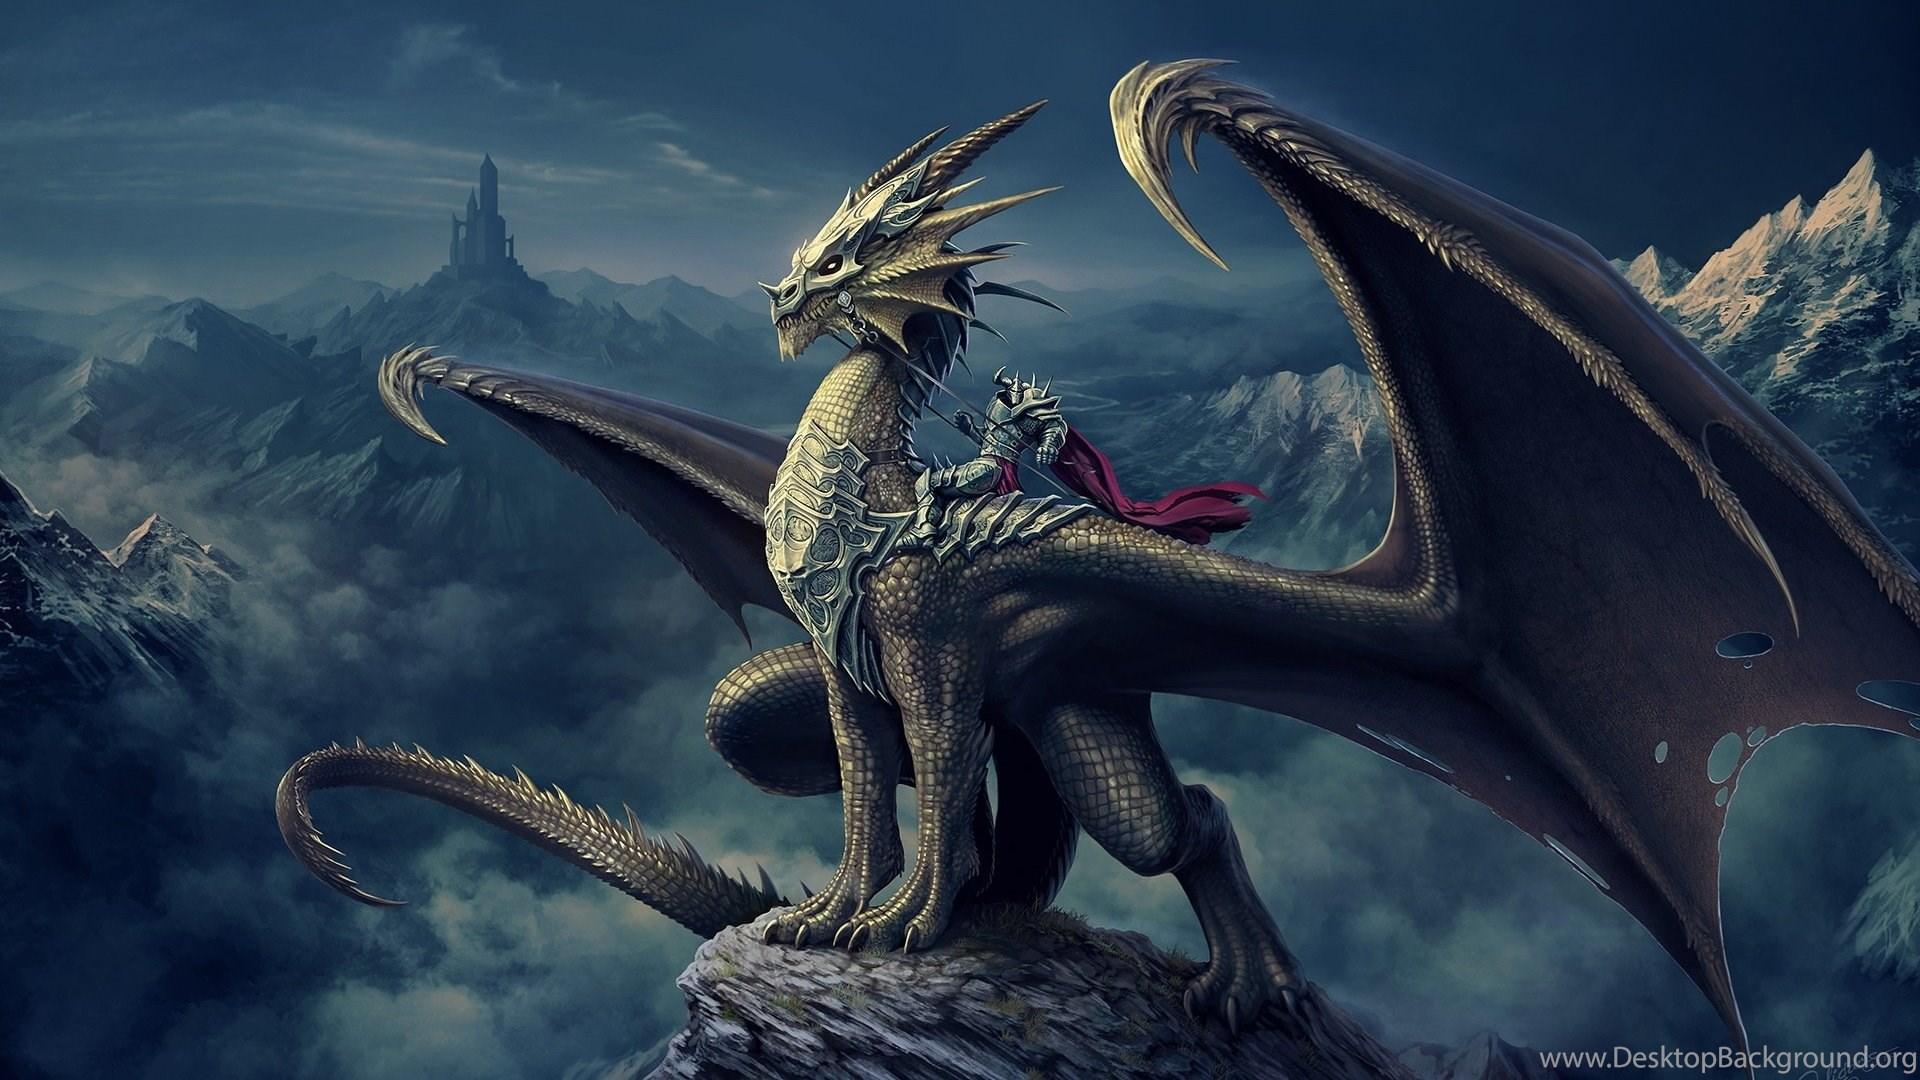 High Resolution Amazing Fantasy Dragon Wallpapers Hd 1 Full Size Desktop Background